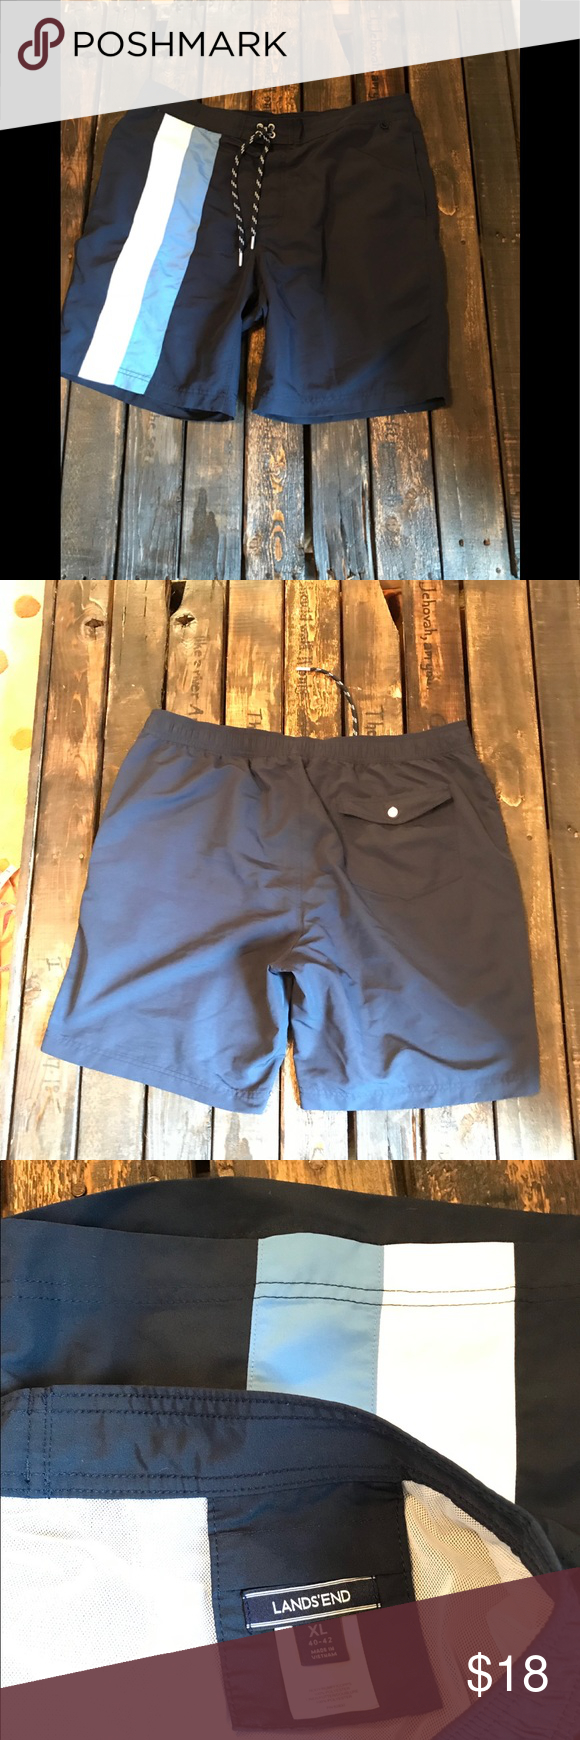 45edeb642b LandsEnd Swim trunks LandsEnd Men's blue swim trunks, brand new condition  Size XL 40-42 Lands' End Swim Swim Trunks